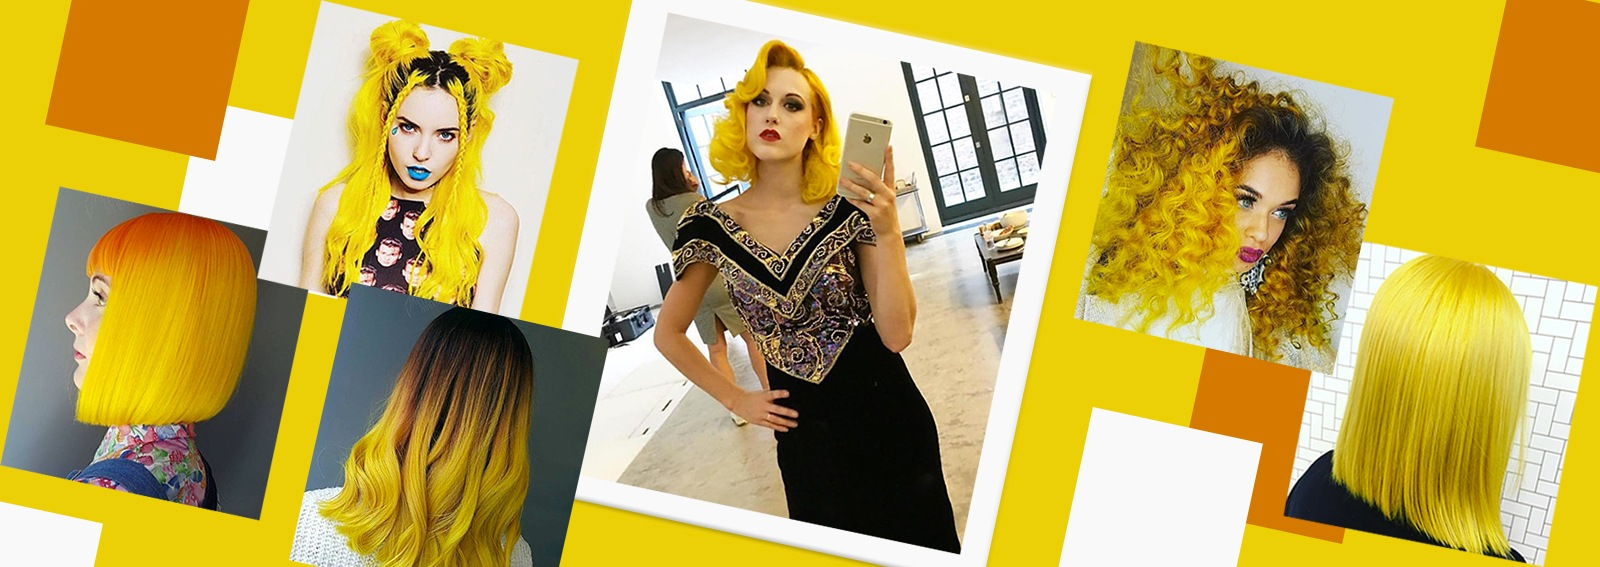 trend capelli gialli collage_desktop